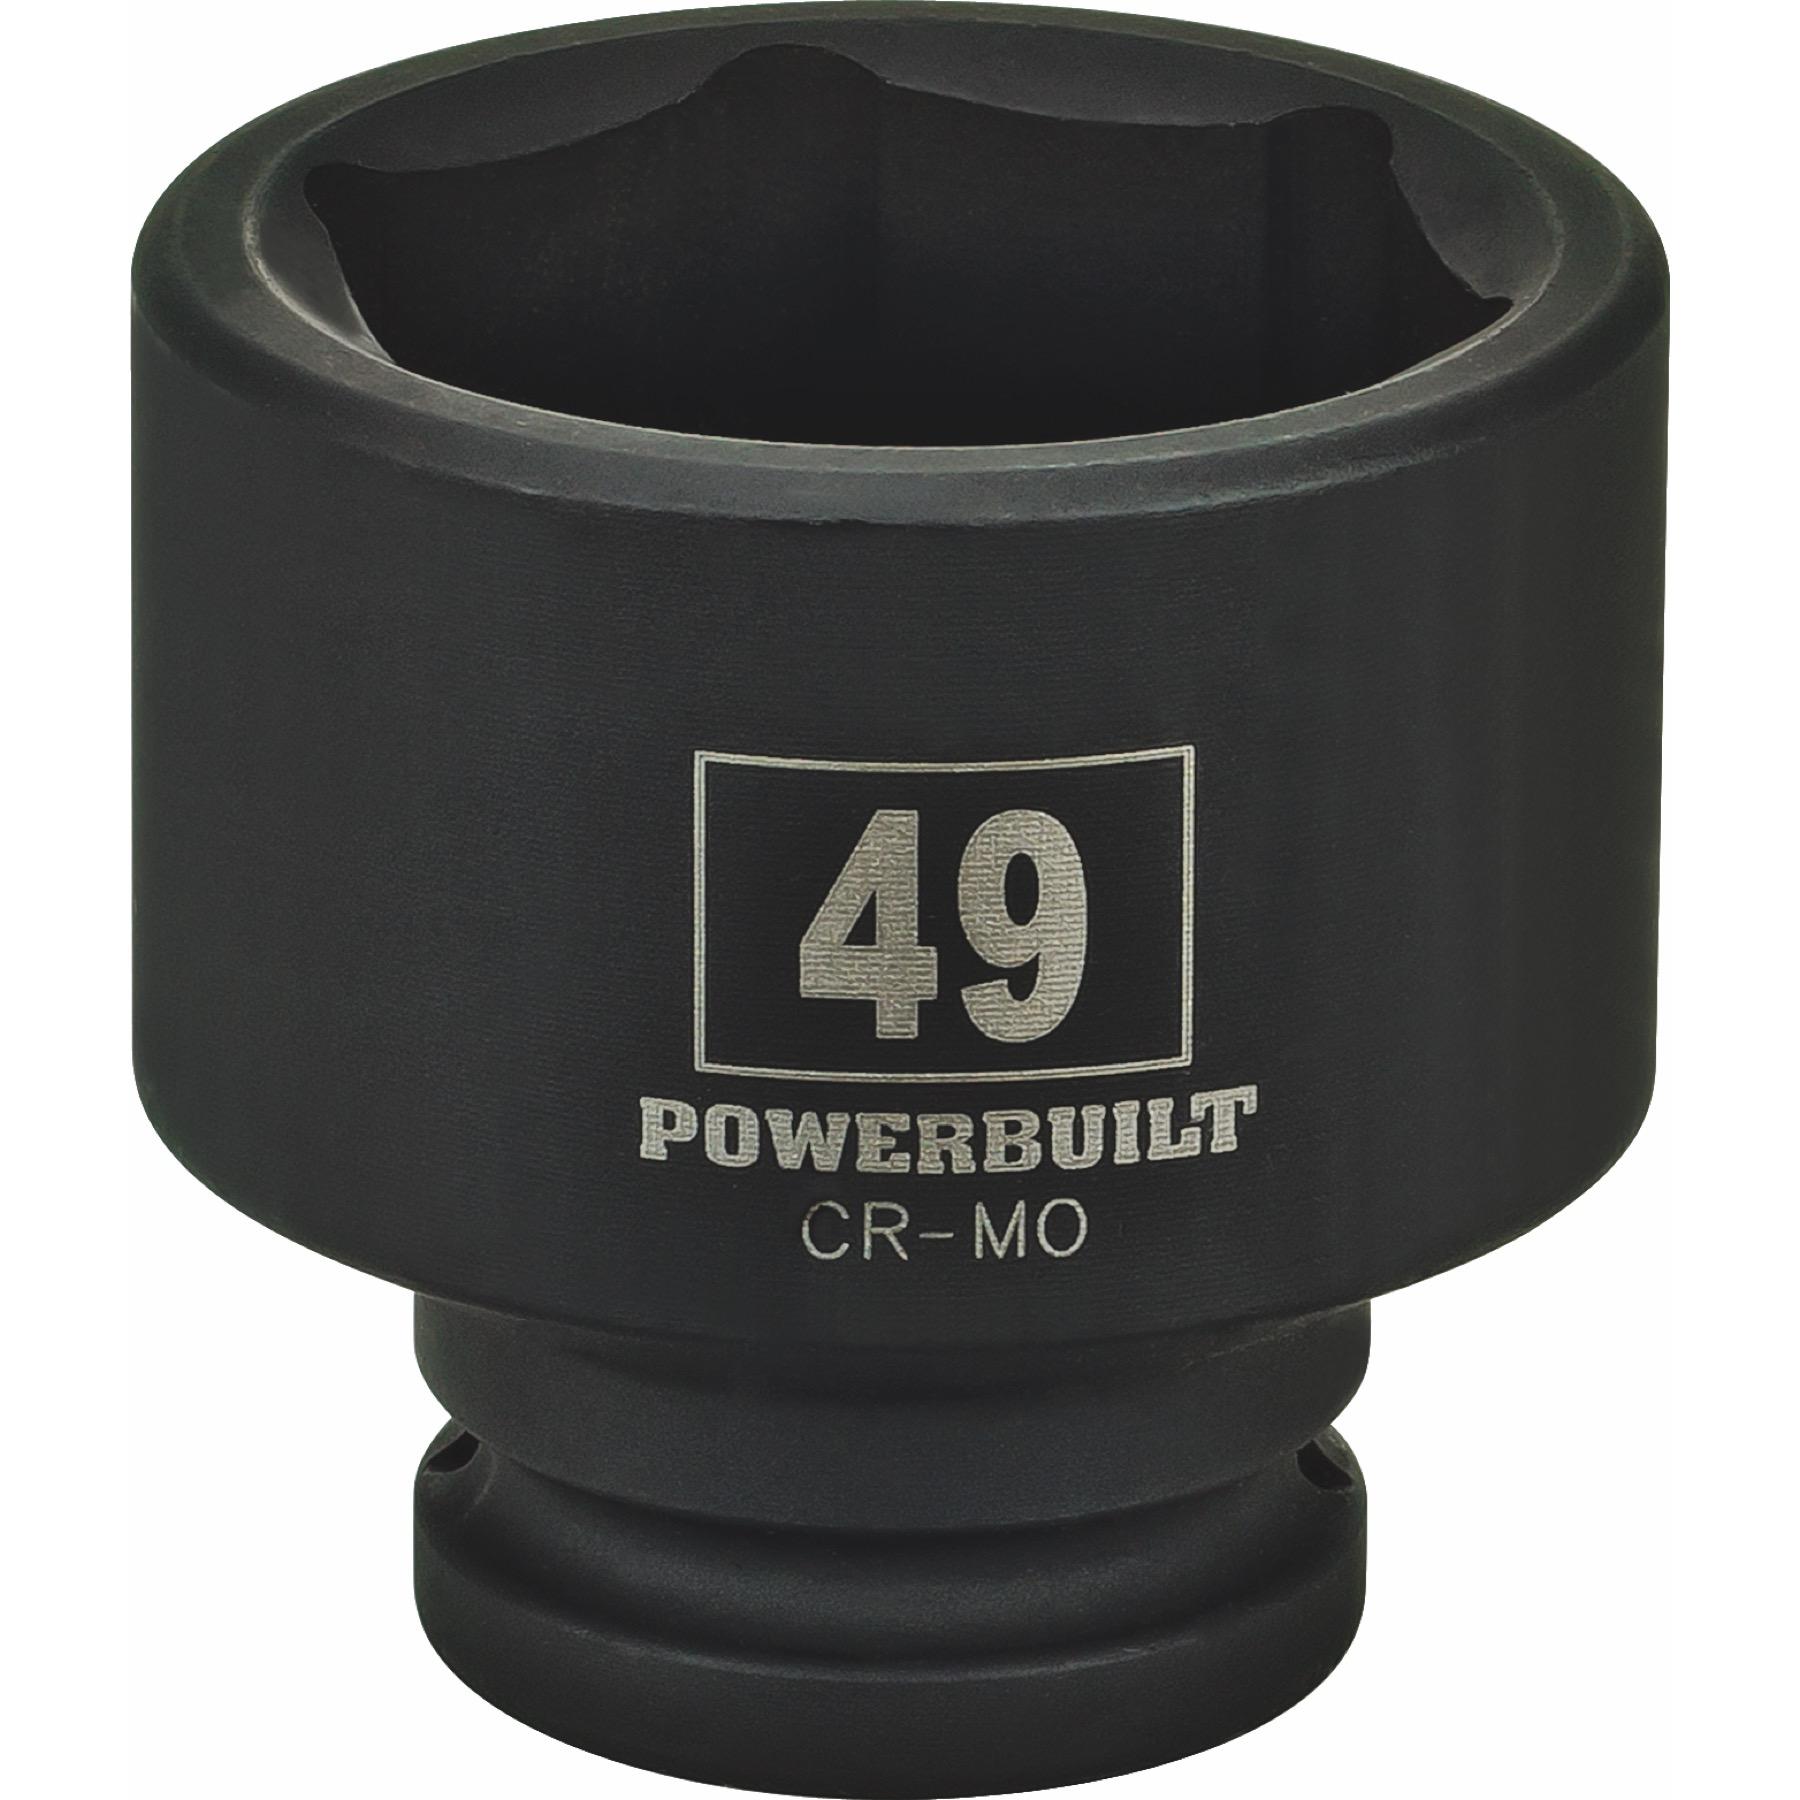 Draper Expert 5028 46mm 3//4-inch Square Drive Hi-Torq 6-Point Impact Socket